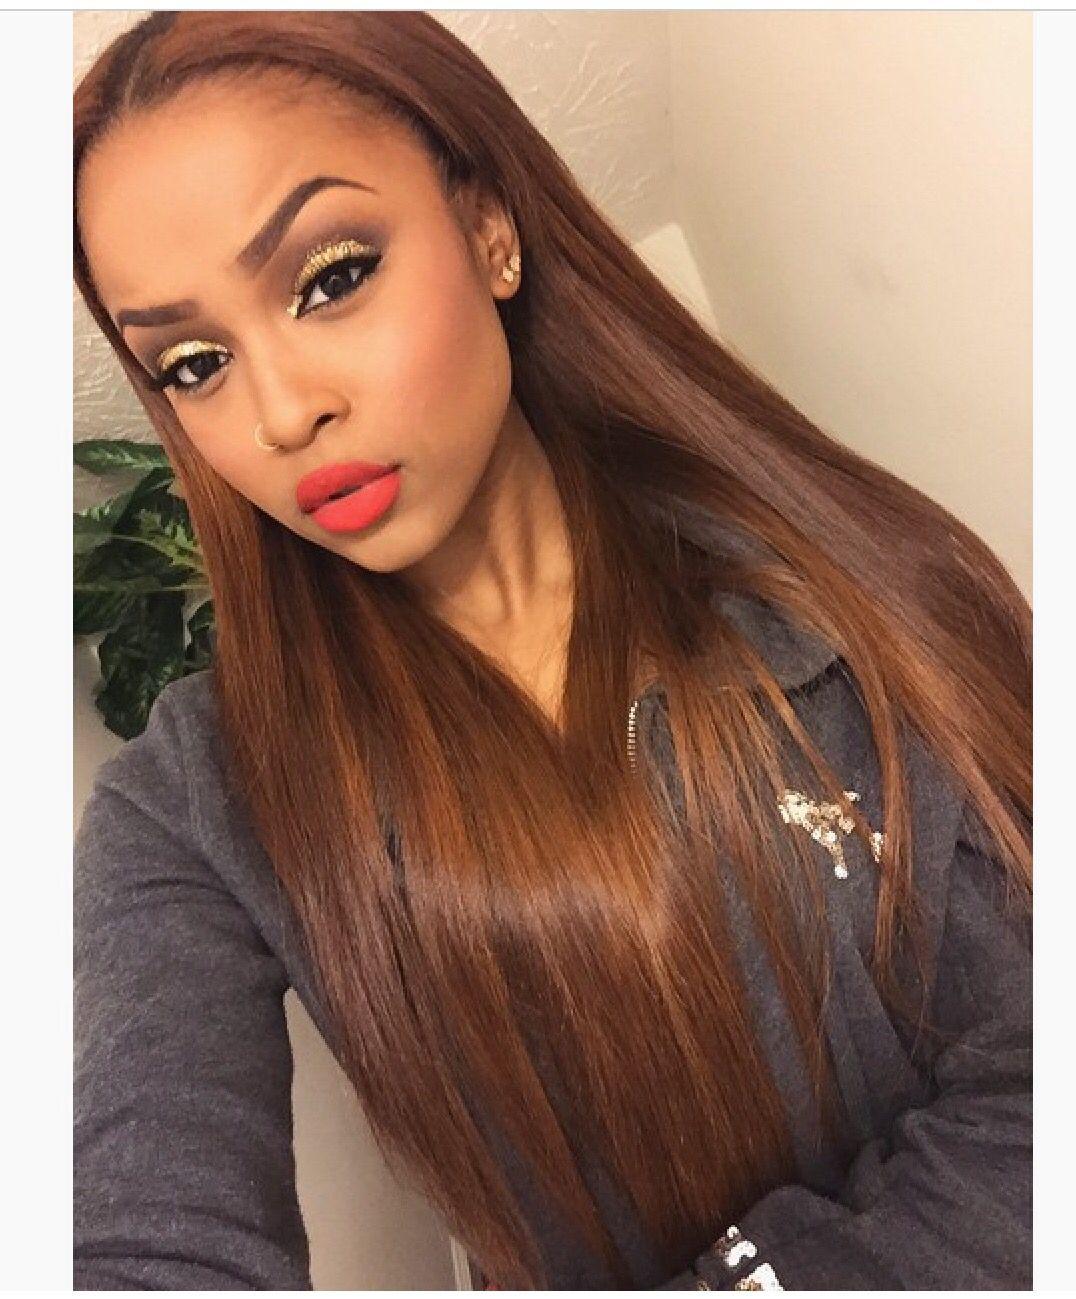 Haircolor pinterest royaltycalme glam sqaud high quality hair form divas wig store on aliexpress virgin human hair wig pmusecretfo Images